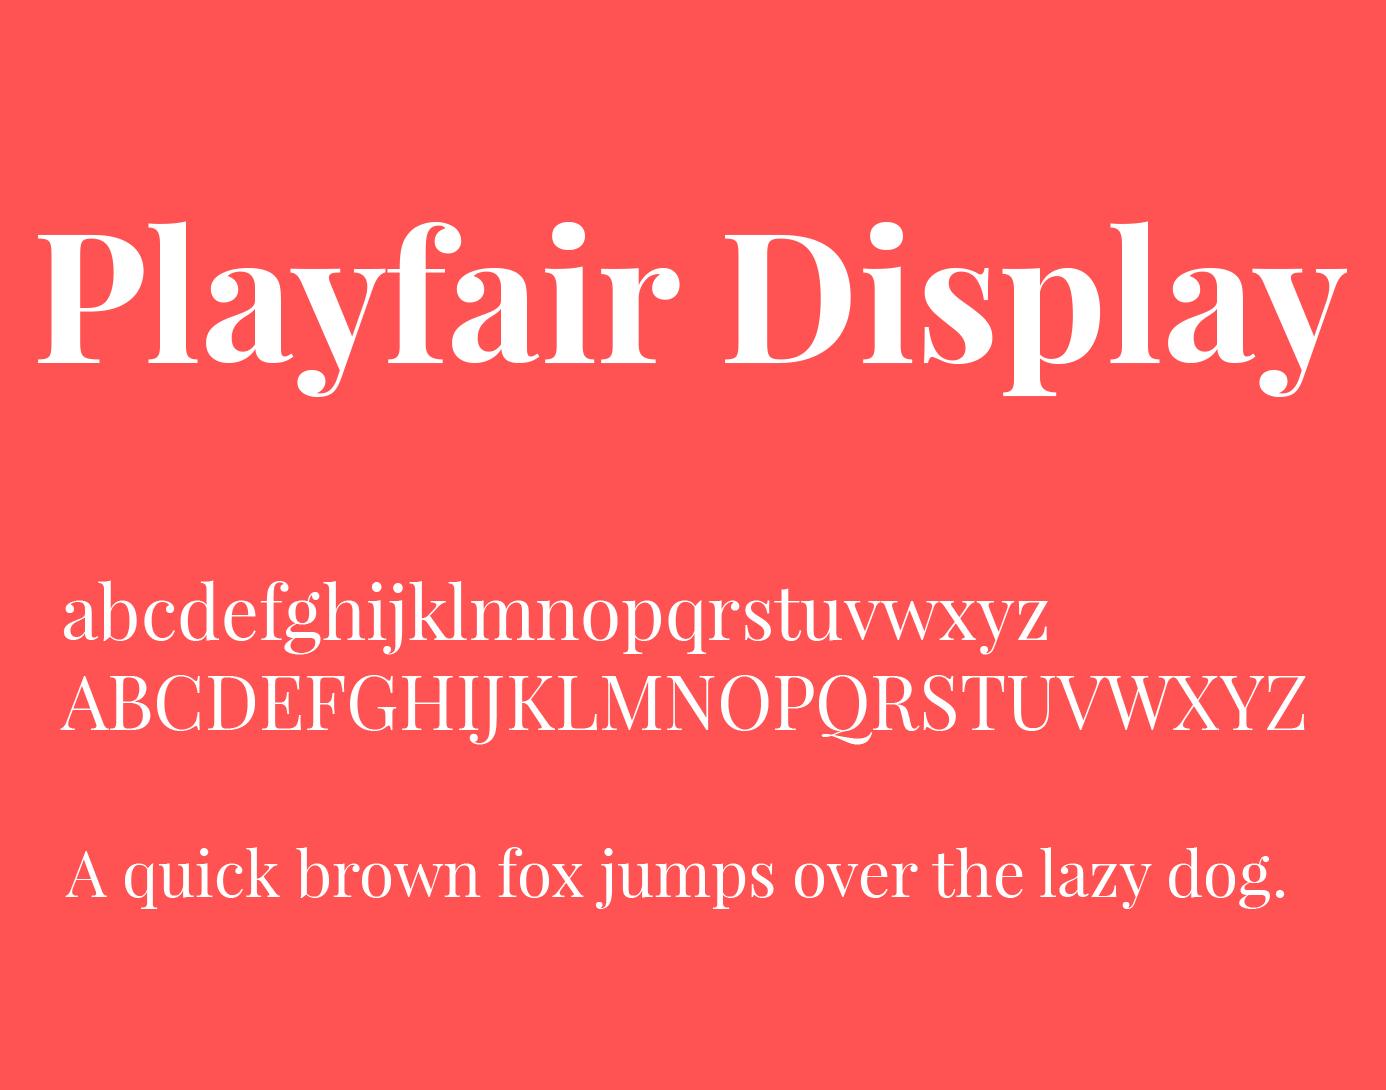 https://fontclarity.com/wp-content/uploads/2019/09/playfair-display-download-0.png Free Download